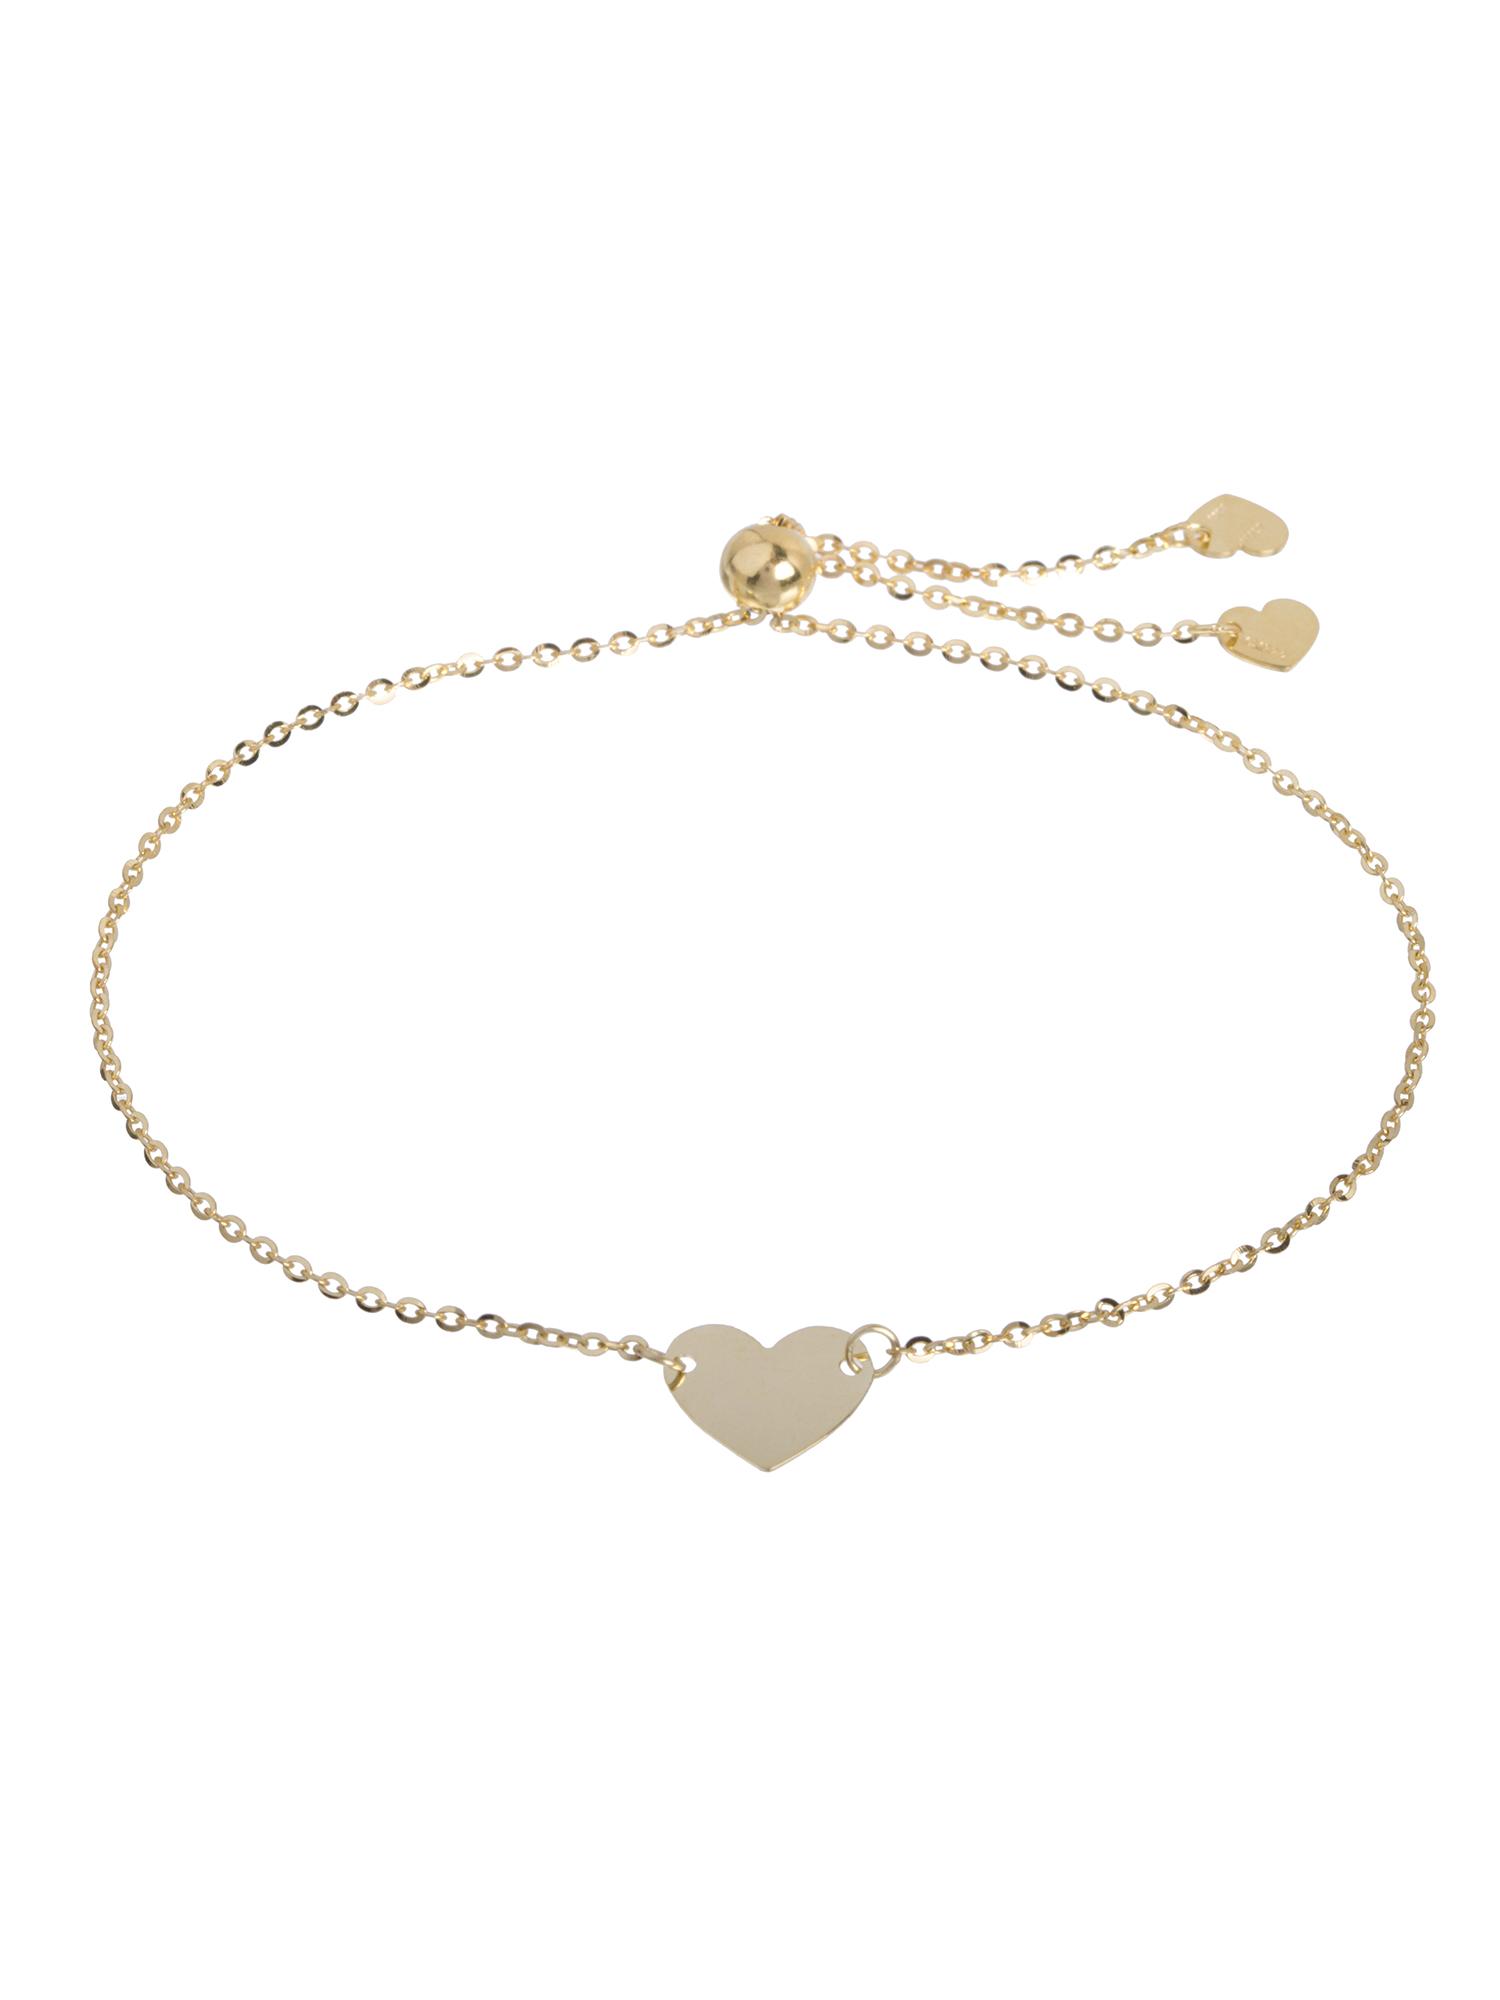 "10kt Yellow Gold Adjustable Heart Bracelet 9"""